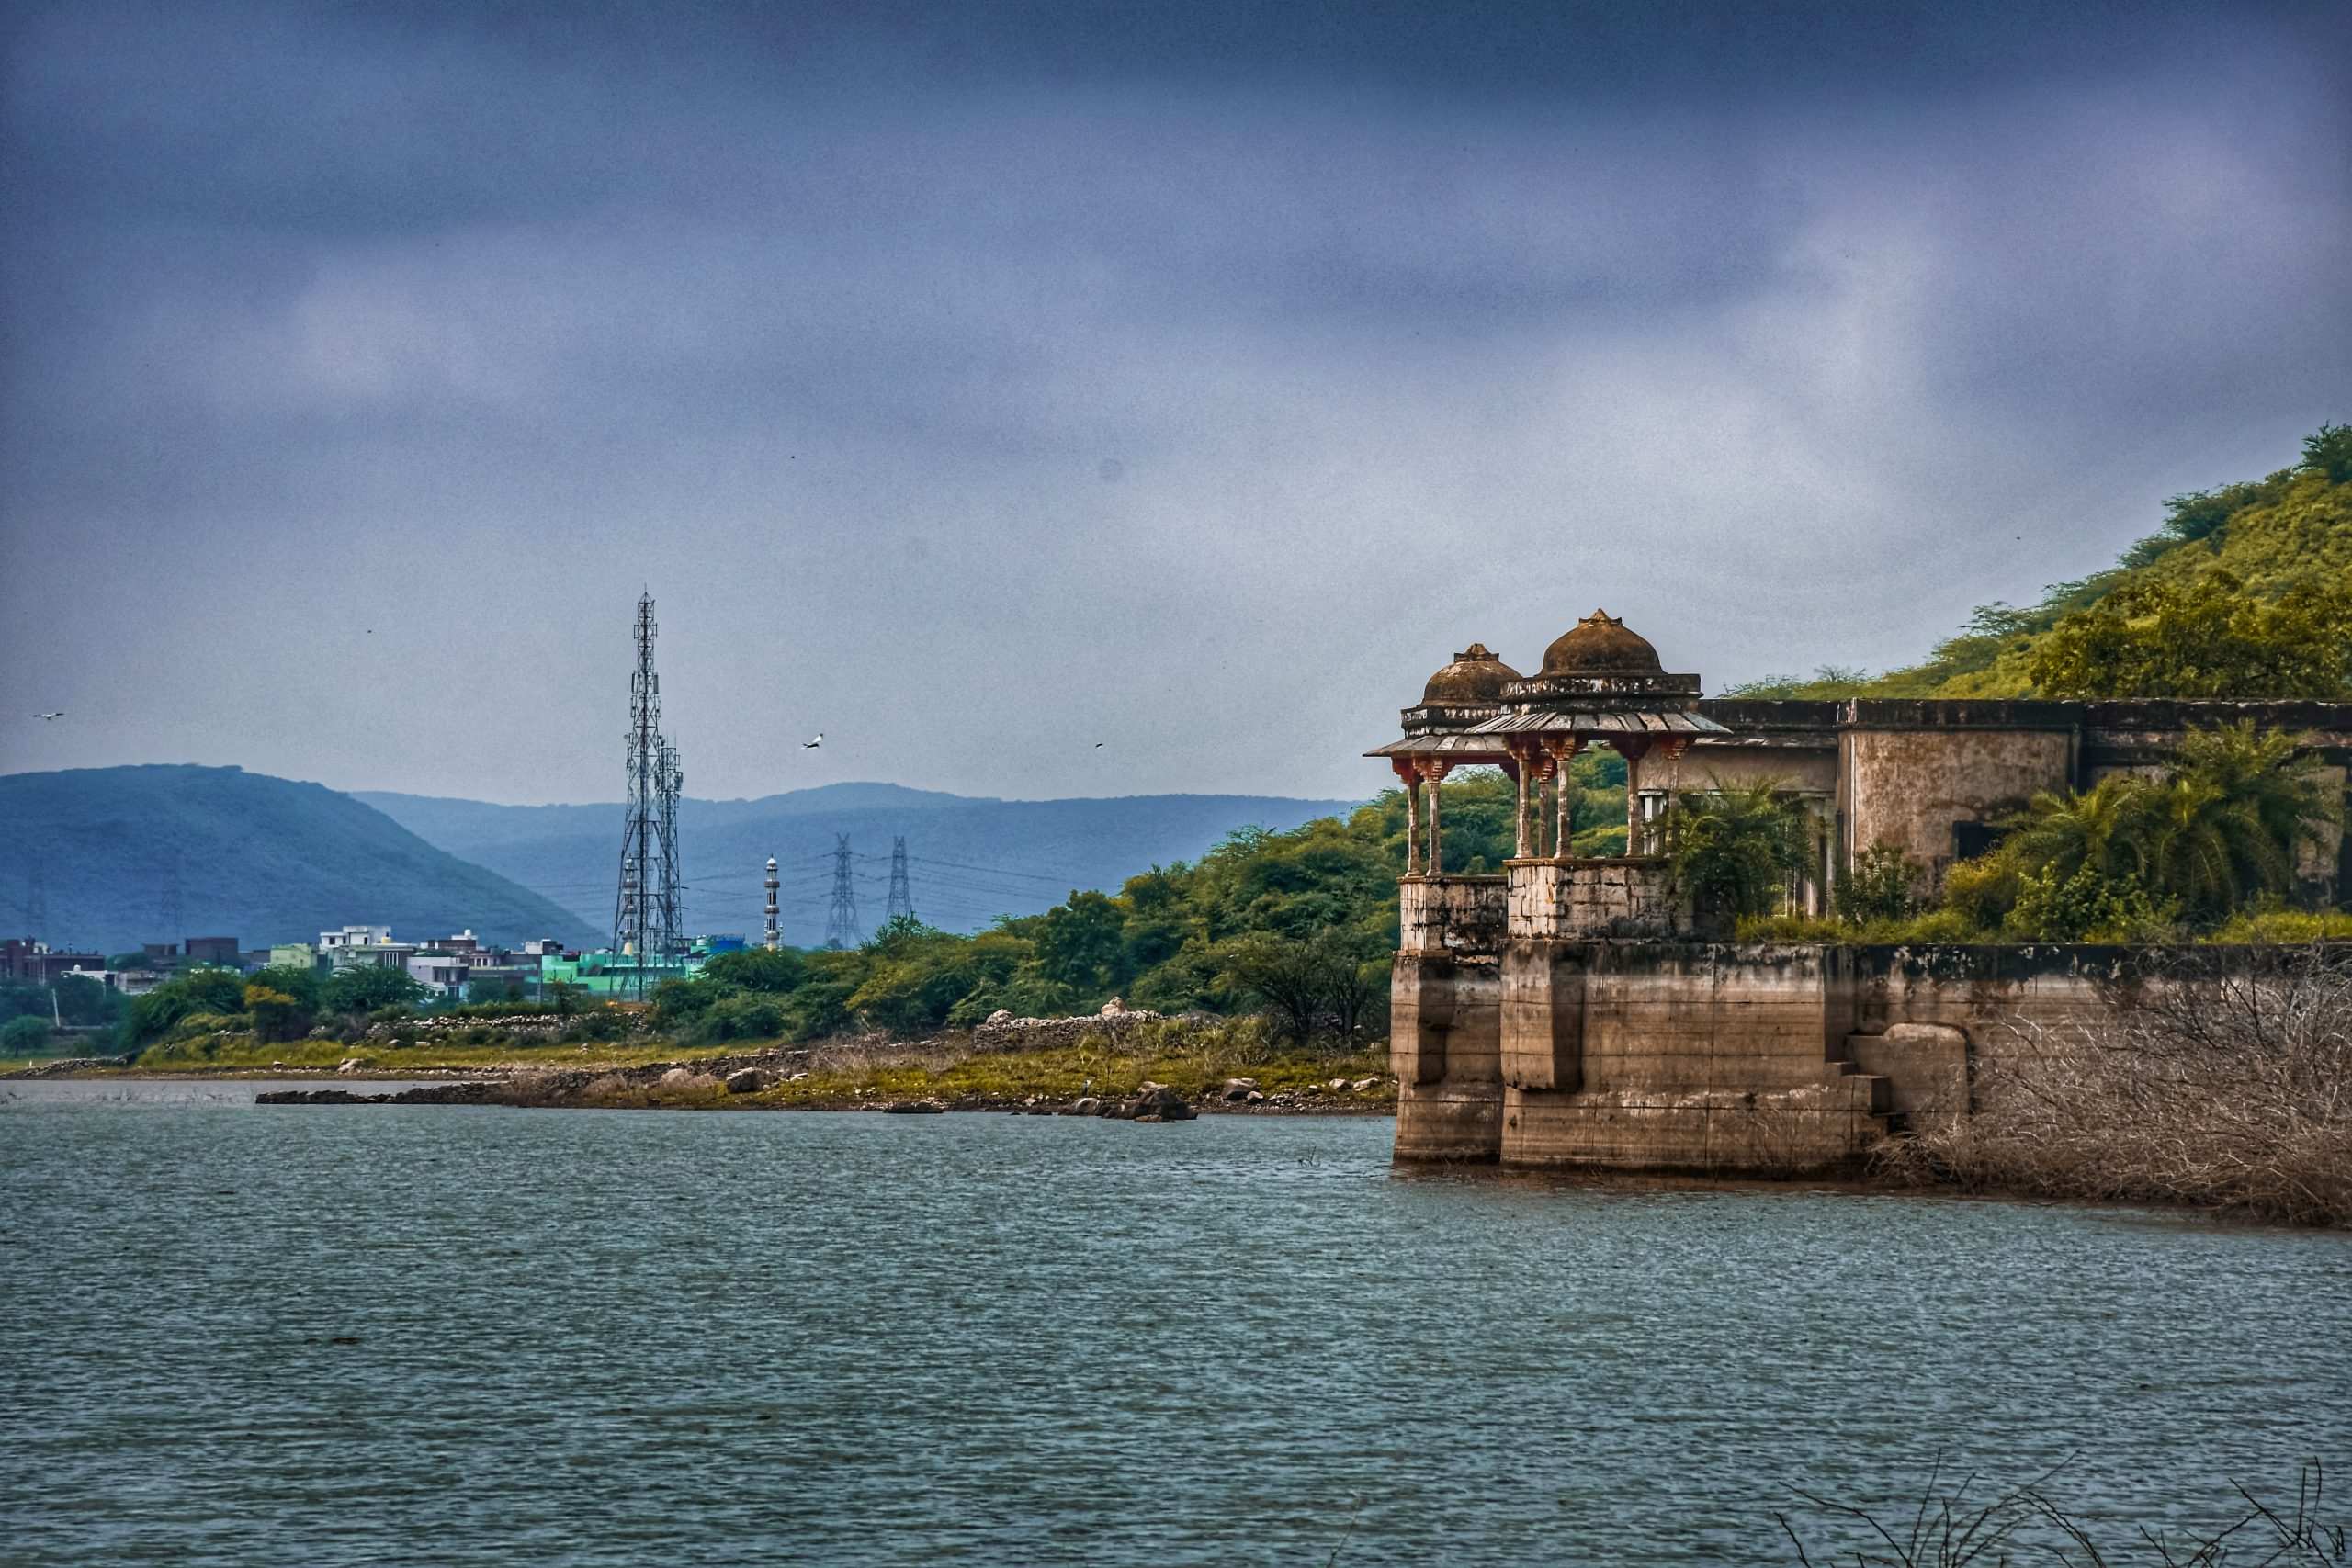 Aesthetic view of Phool Sagar Lake in Bundi.